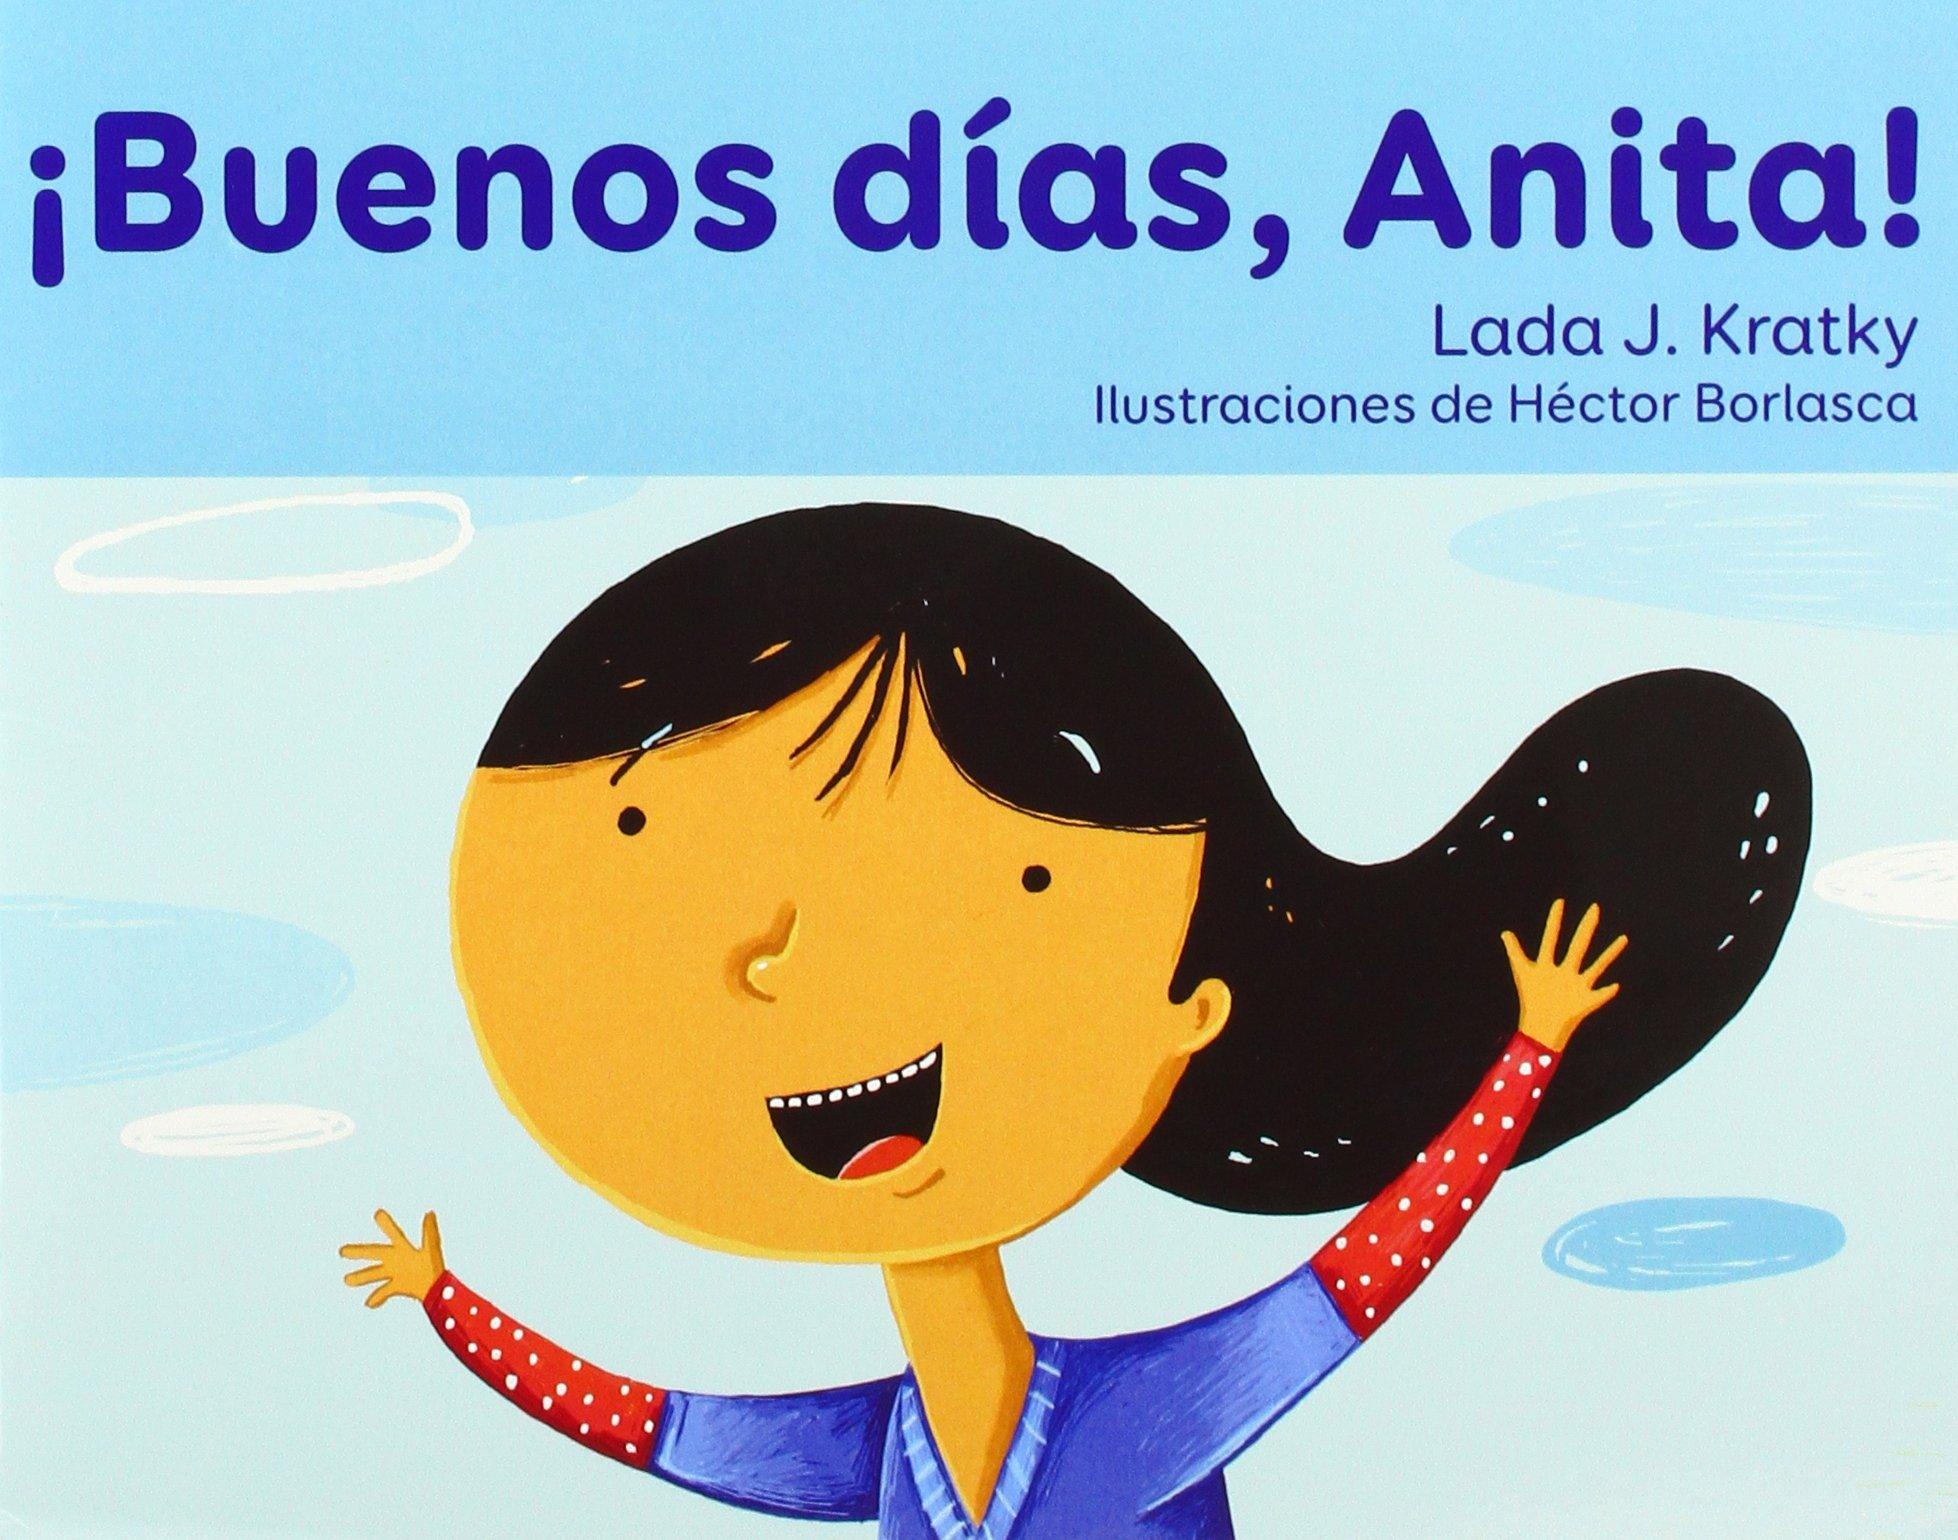 Buenos Dias, Anita! (Facil de Leer / Easy to Read) (Spanish Edition) (Spanish) Paperback – June 1, 2018